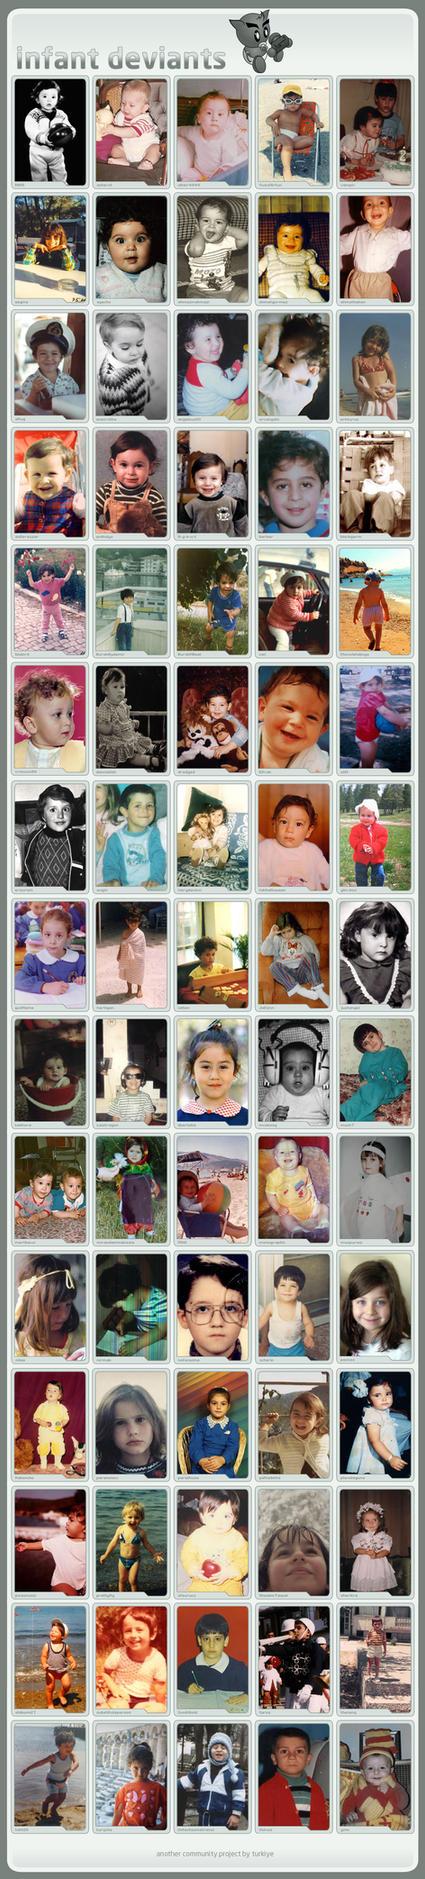 infant deviants by turkiye